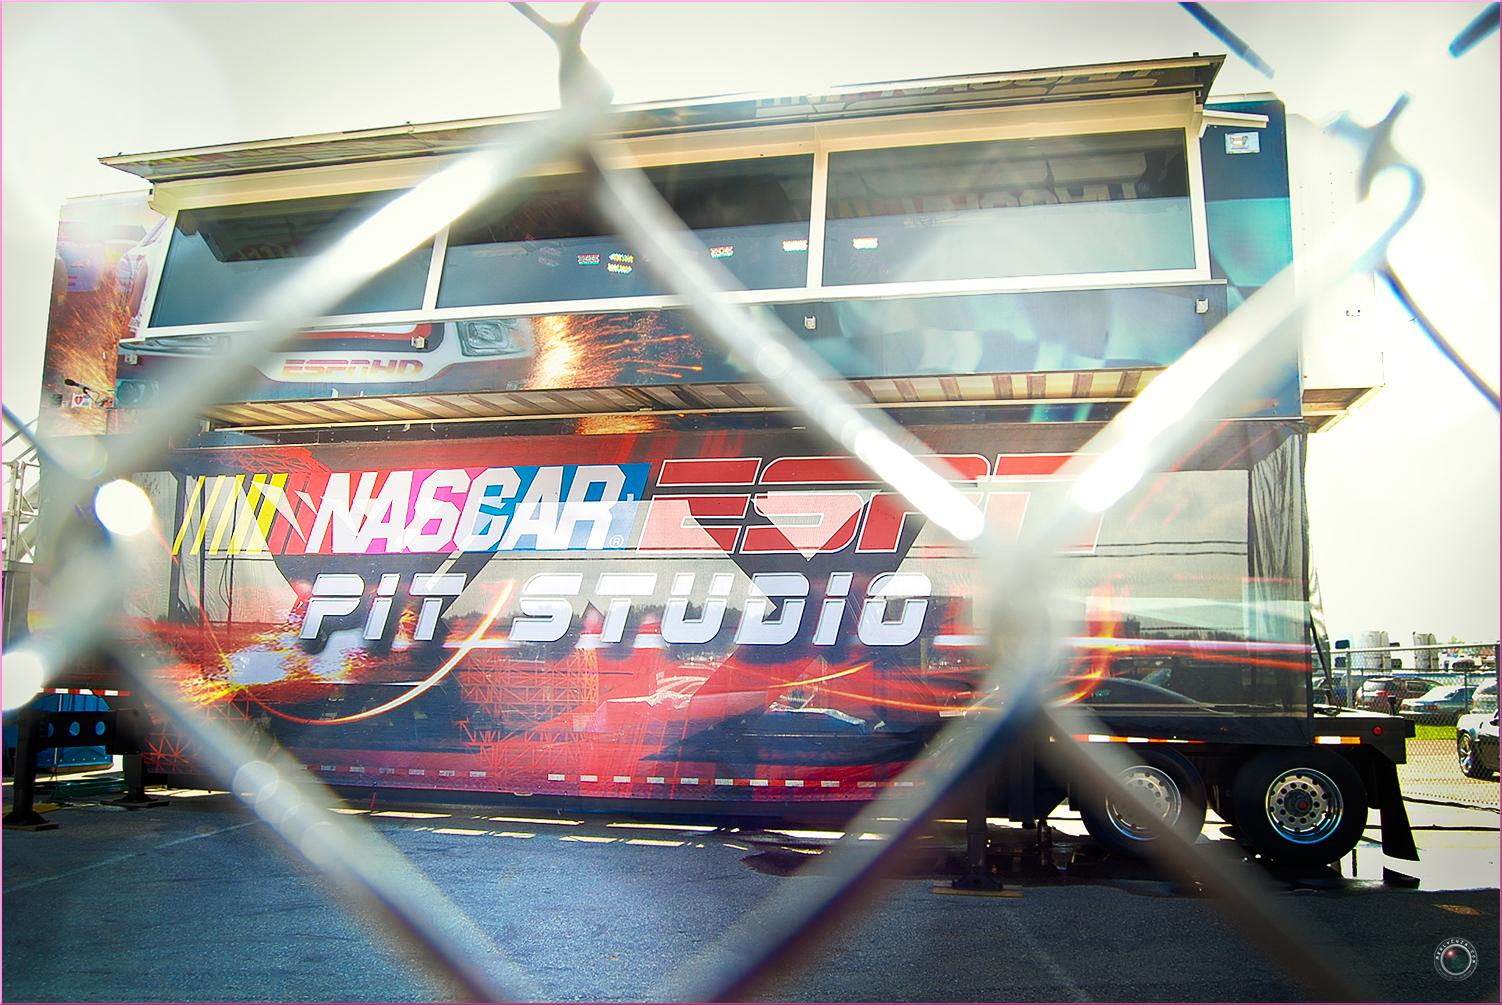 58 Nascar Pit Studio at Track